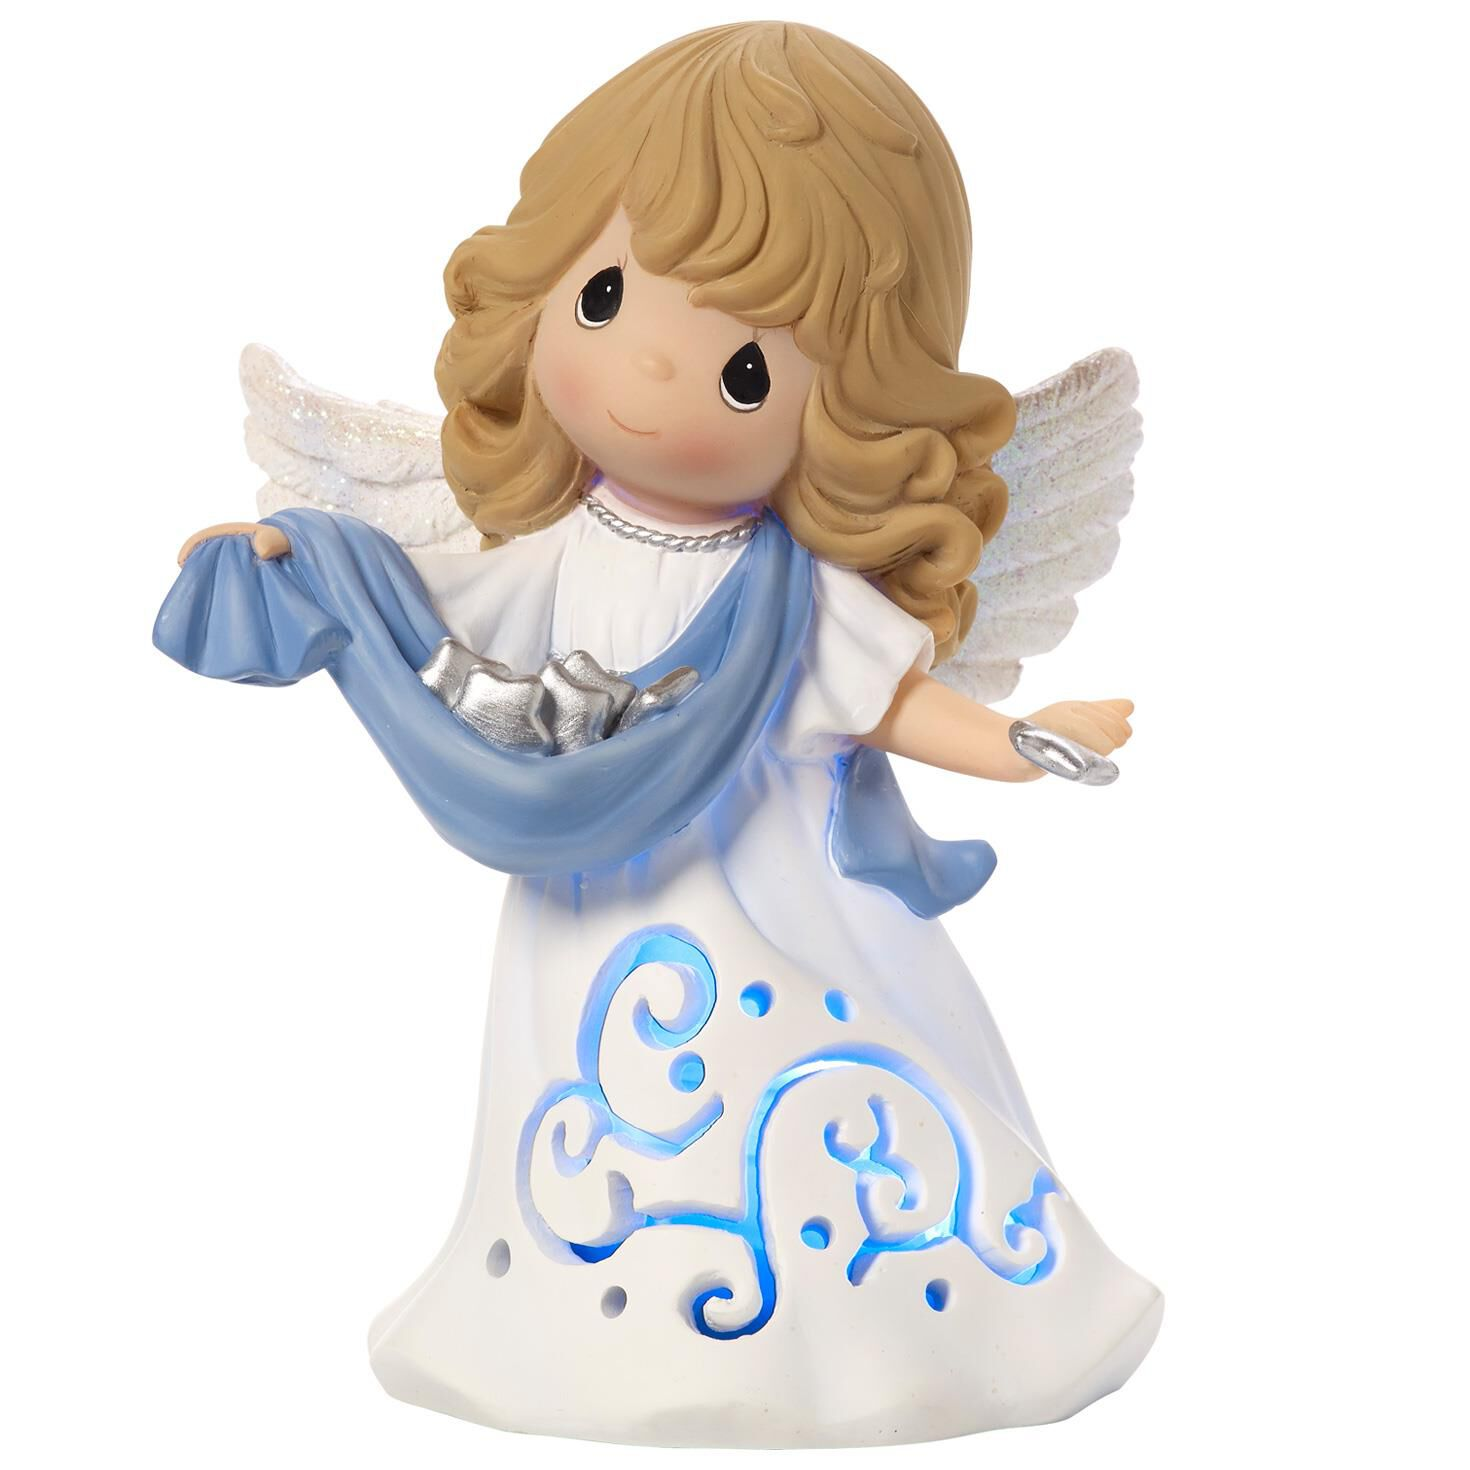 Precious Moments® Hark! The Herald Angels Sing Angel Musical Figurine -  Figurines - Hallmark